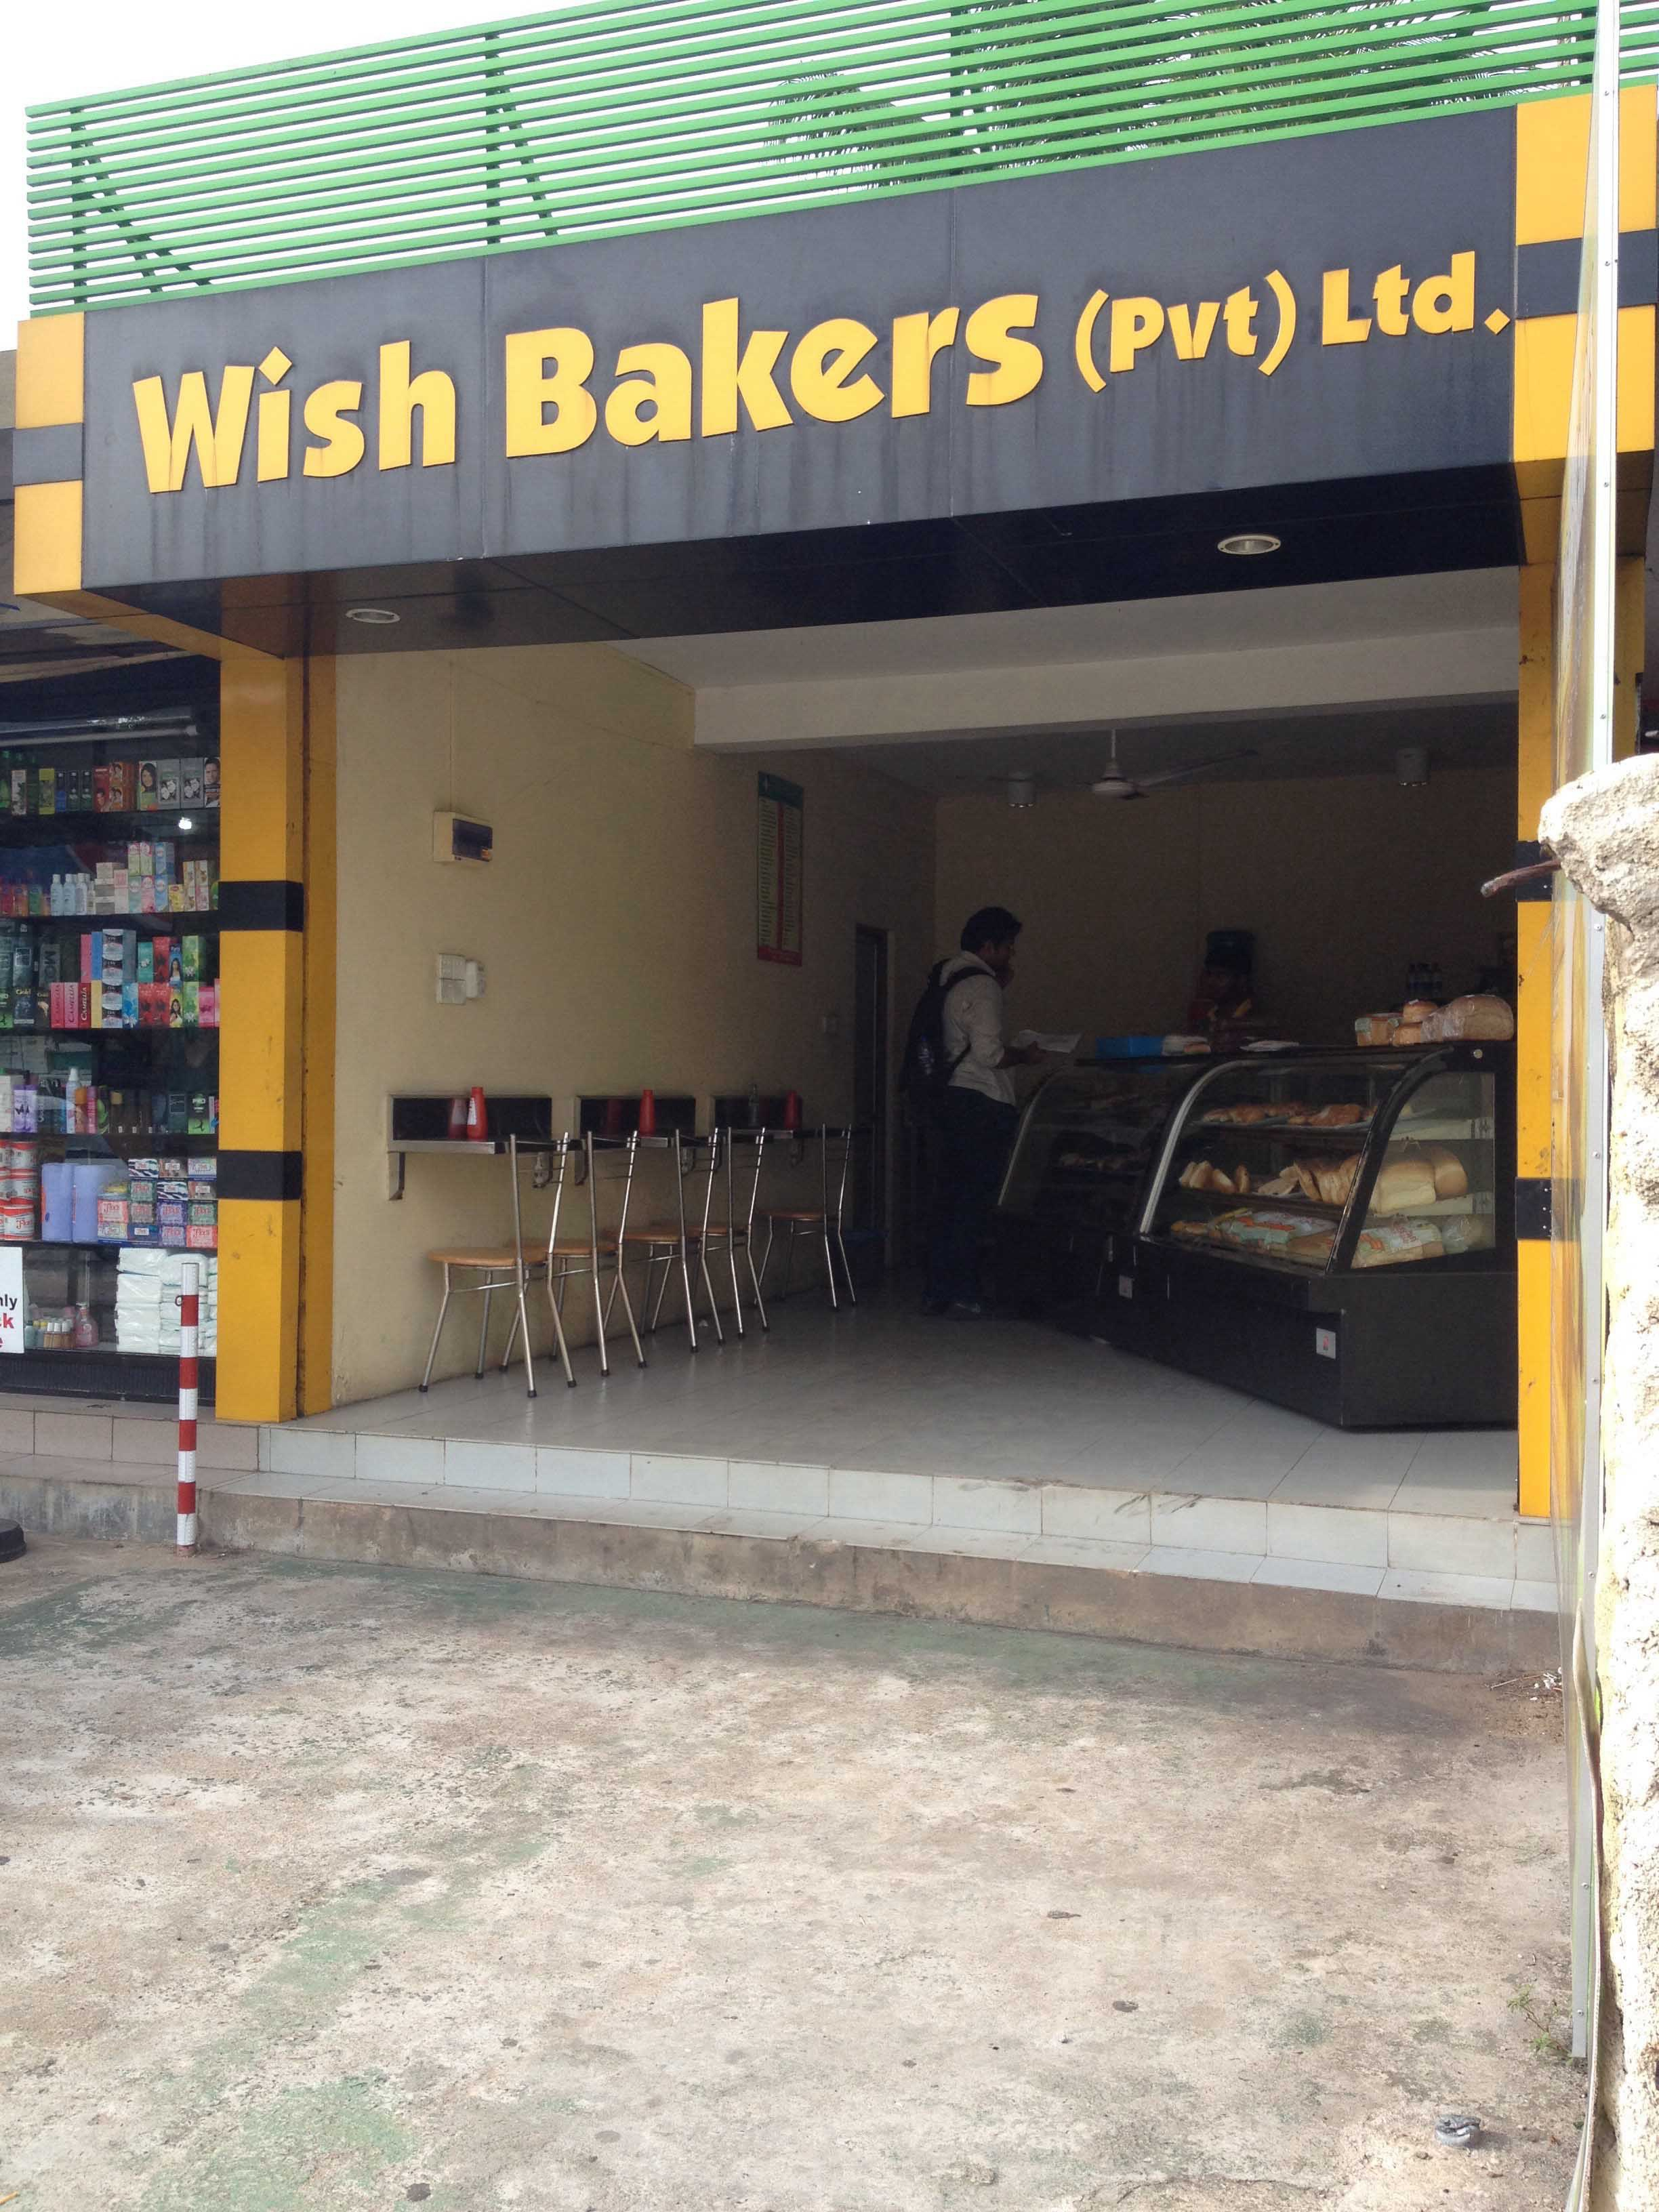 Wish Bakers